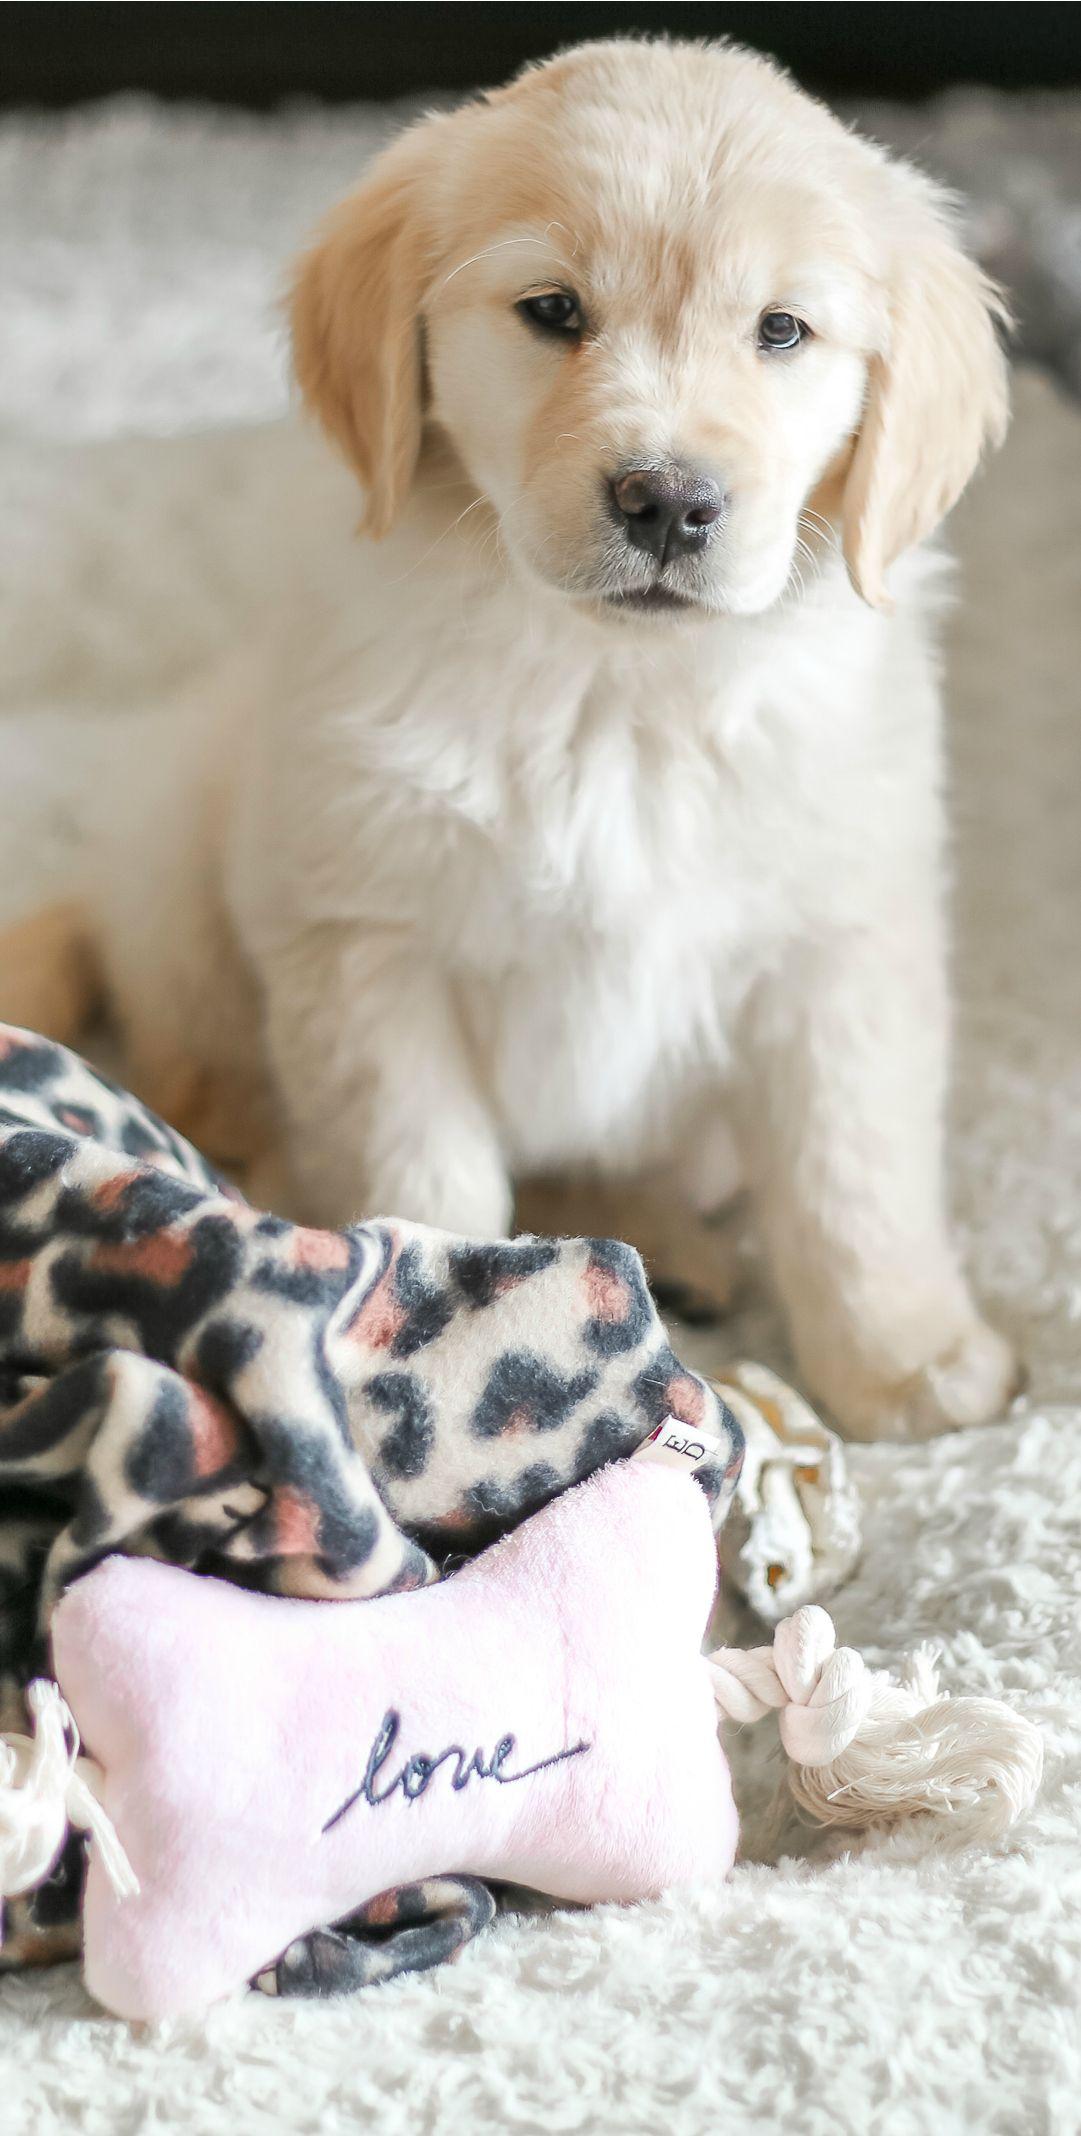 Meet Nala Our New Golden Retriever Puppy Diary Of A Debutante Golden Retriever Puppy Golden Retriever English Golden Retriever Puppy